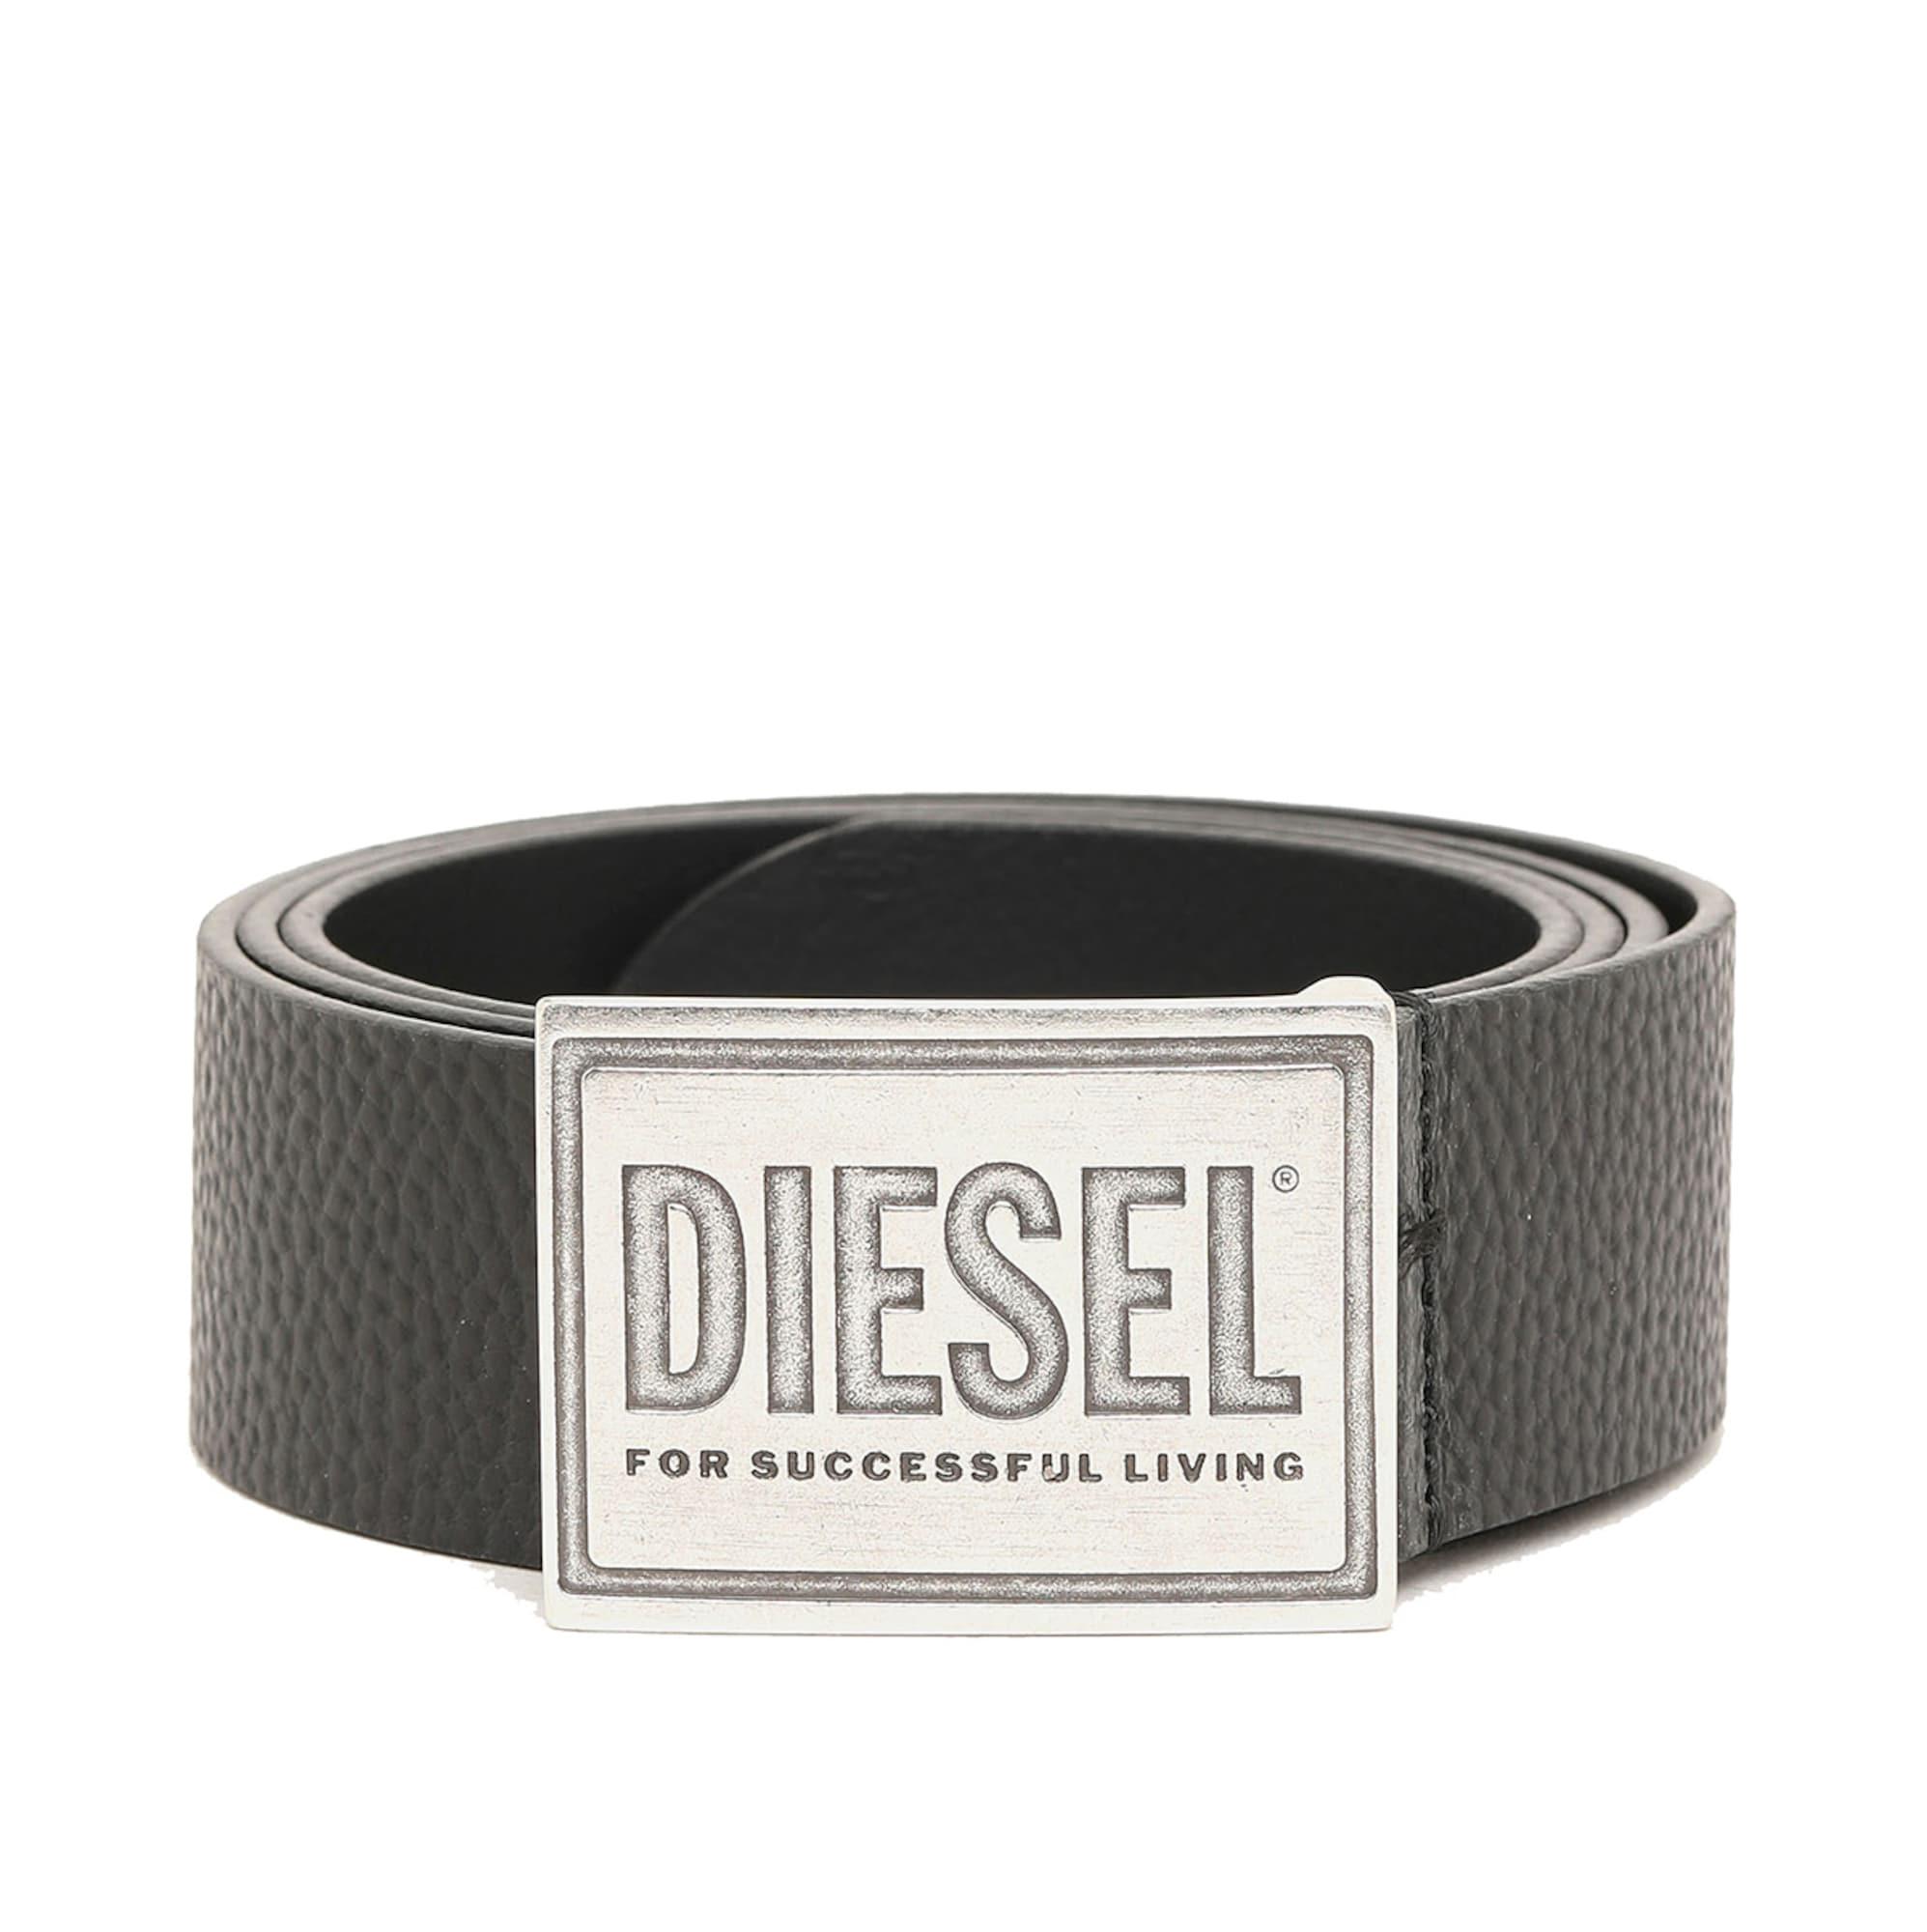 Diesel Ceinture 'B-GRAIN'  - Noir - Taille: 95 - male